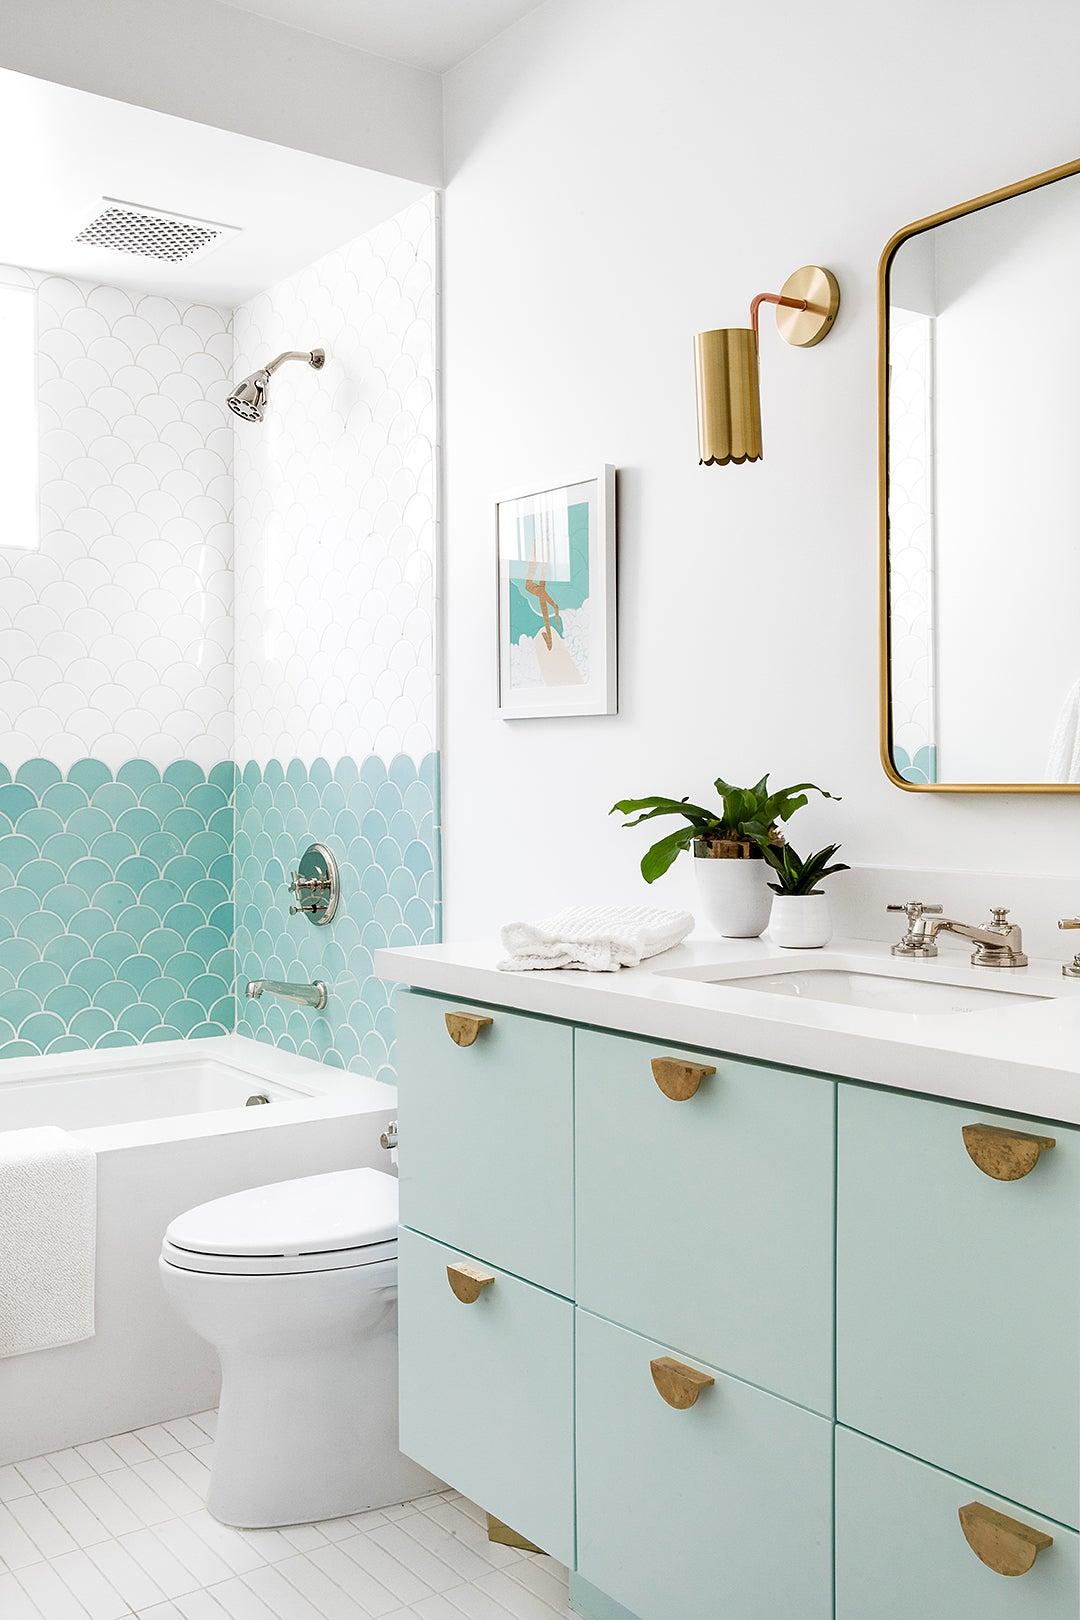 fishscale tile